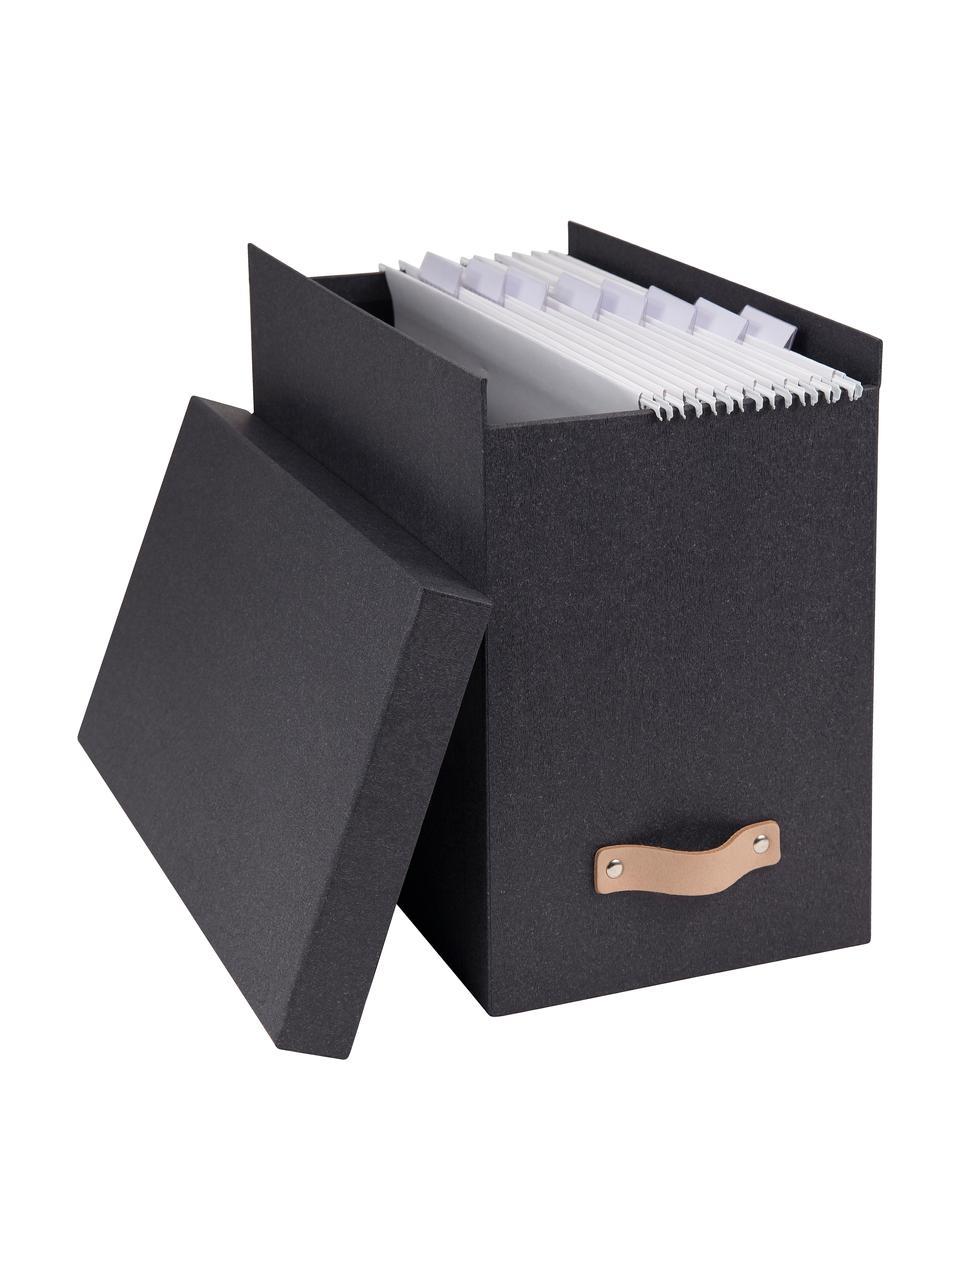 Organizzatore per documenti Johan II 9 pz, Manico: pelle, Organizzatore esterno: nero Organizzatore interno: nero Manico: beige, Larg. 19 x Alt. 27 cm